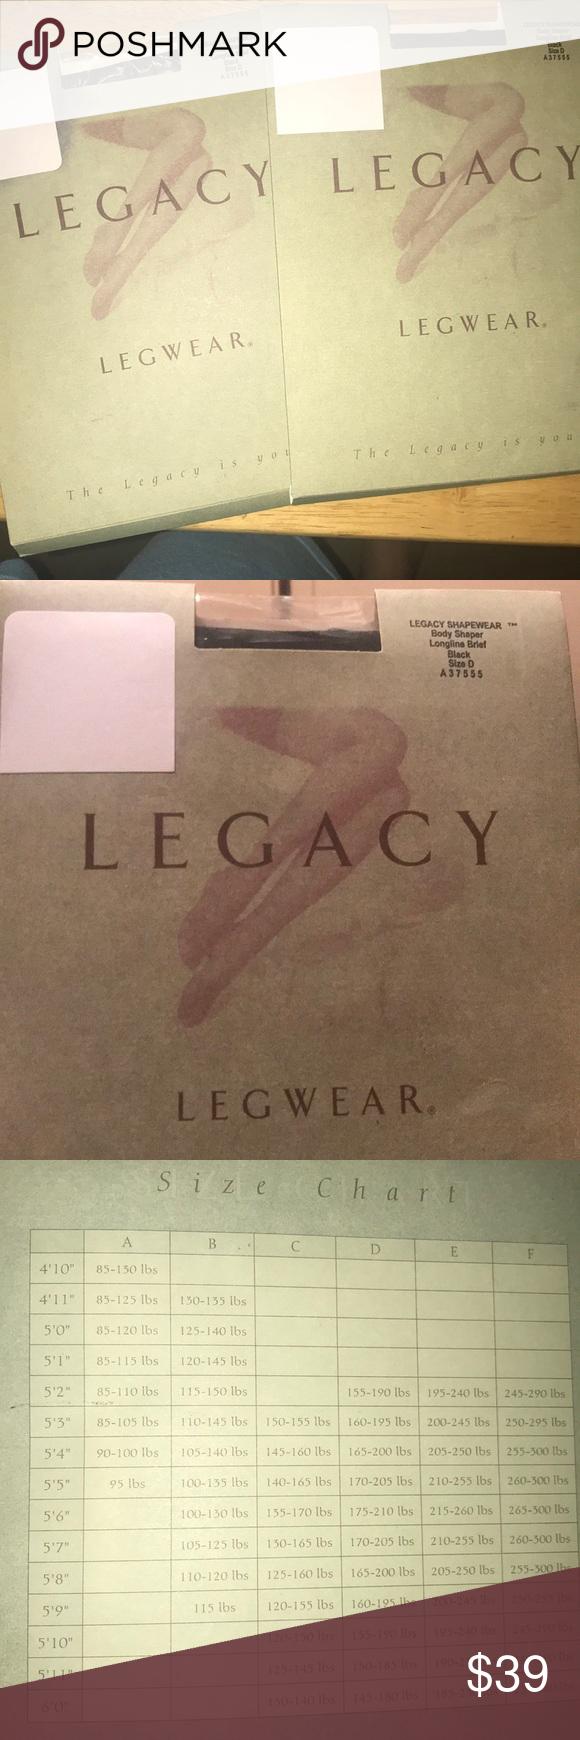 Legacy Legwear Bodyshaper Shapewear Lot Of 2 Lot Of 2 Legacy Legwear Shapewear Body Shaper Longline Brief Black Size D Fits Shapewear Body Shapers Legwear